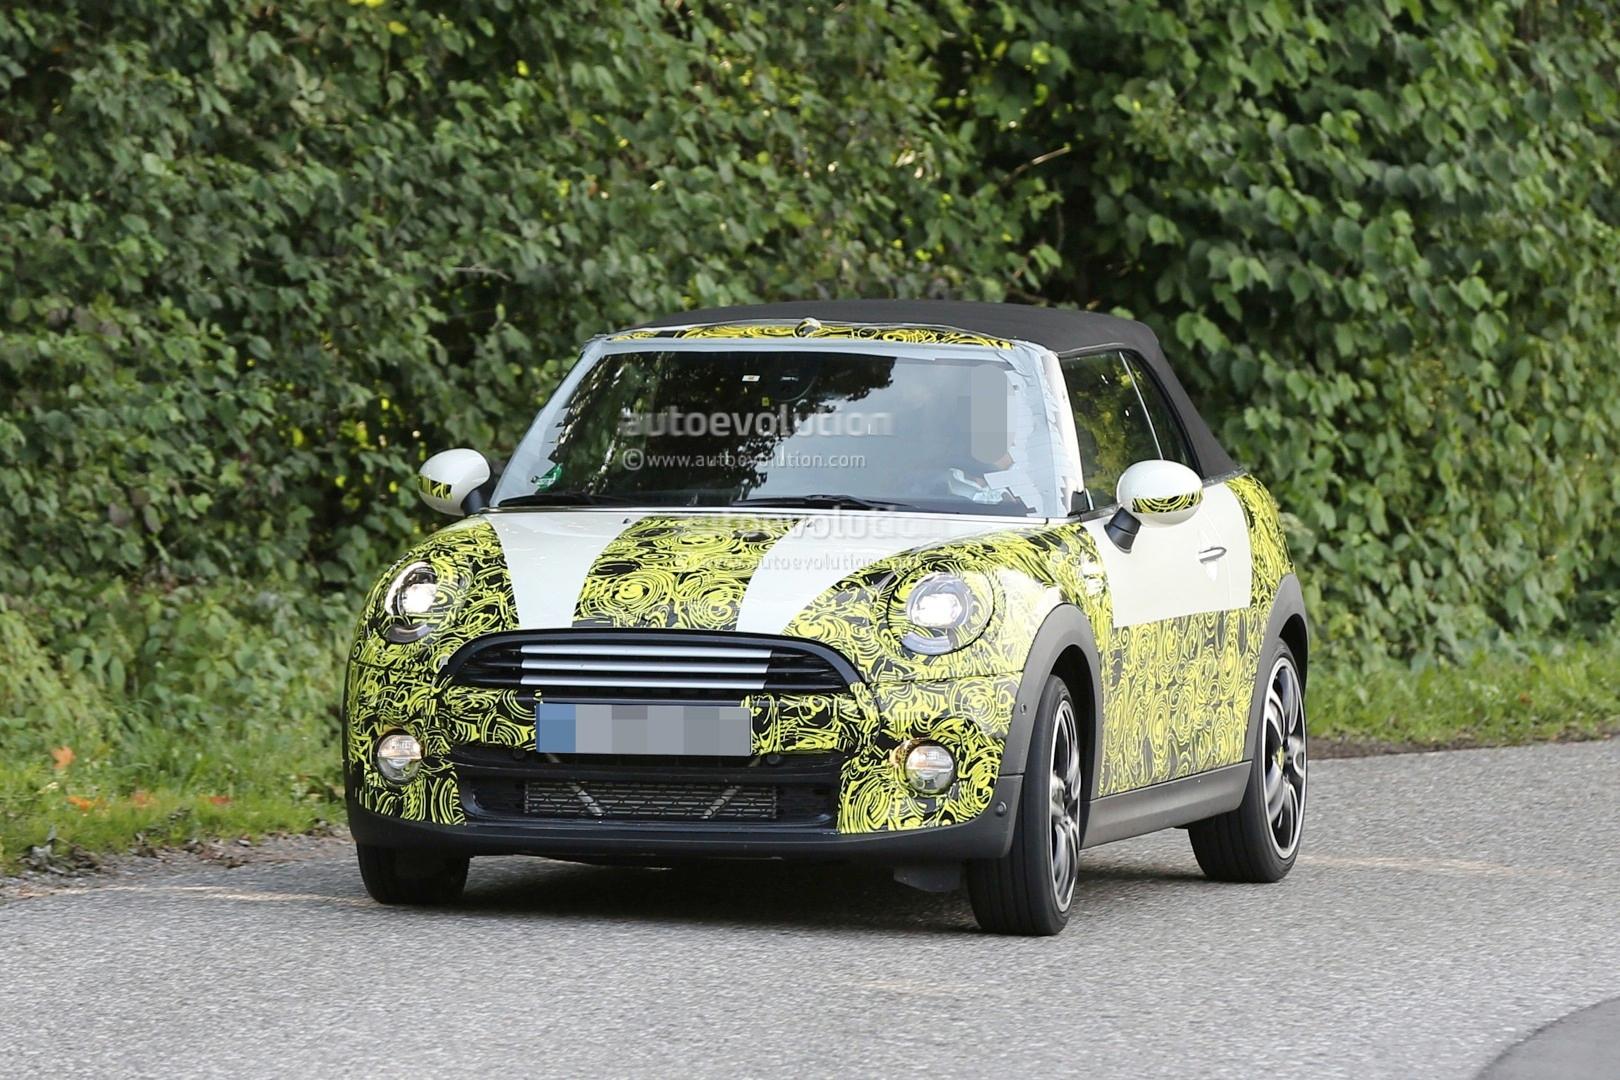 Mini Cooper 2015 : 2015 mini cooper convertible spied before la auto show debut autoevolution ~ Medecine-chirurgie-esthetiques.com Avis de Voitures